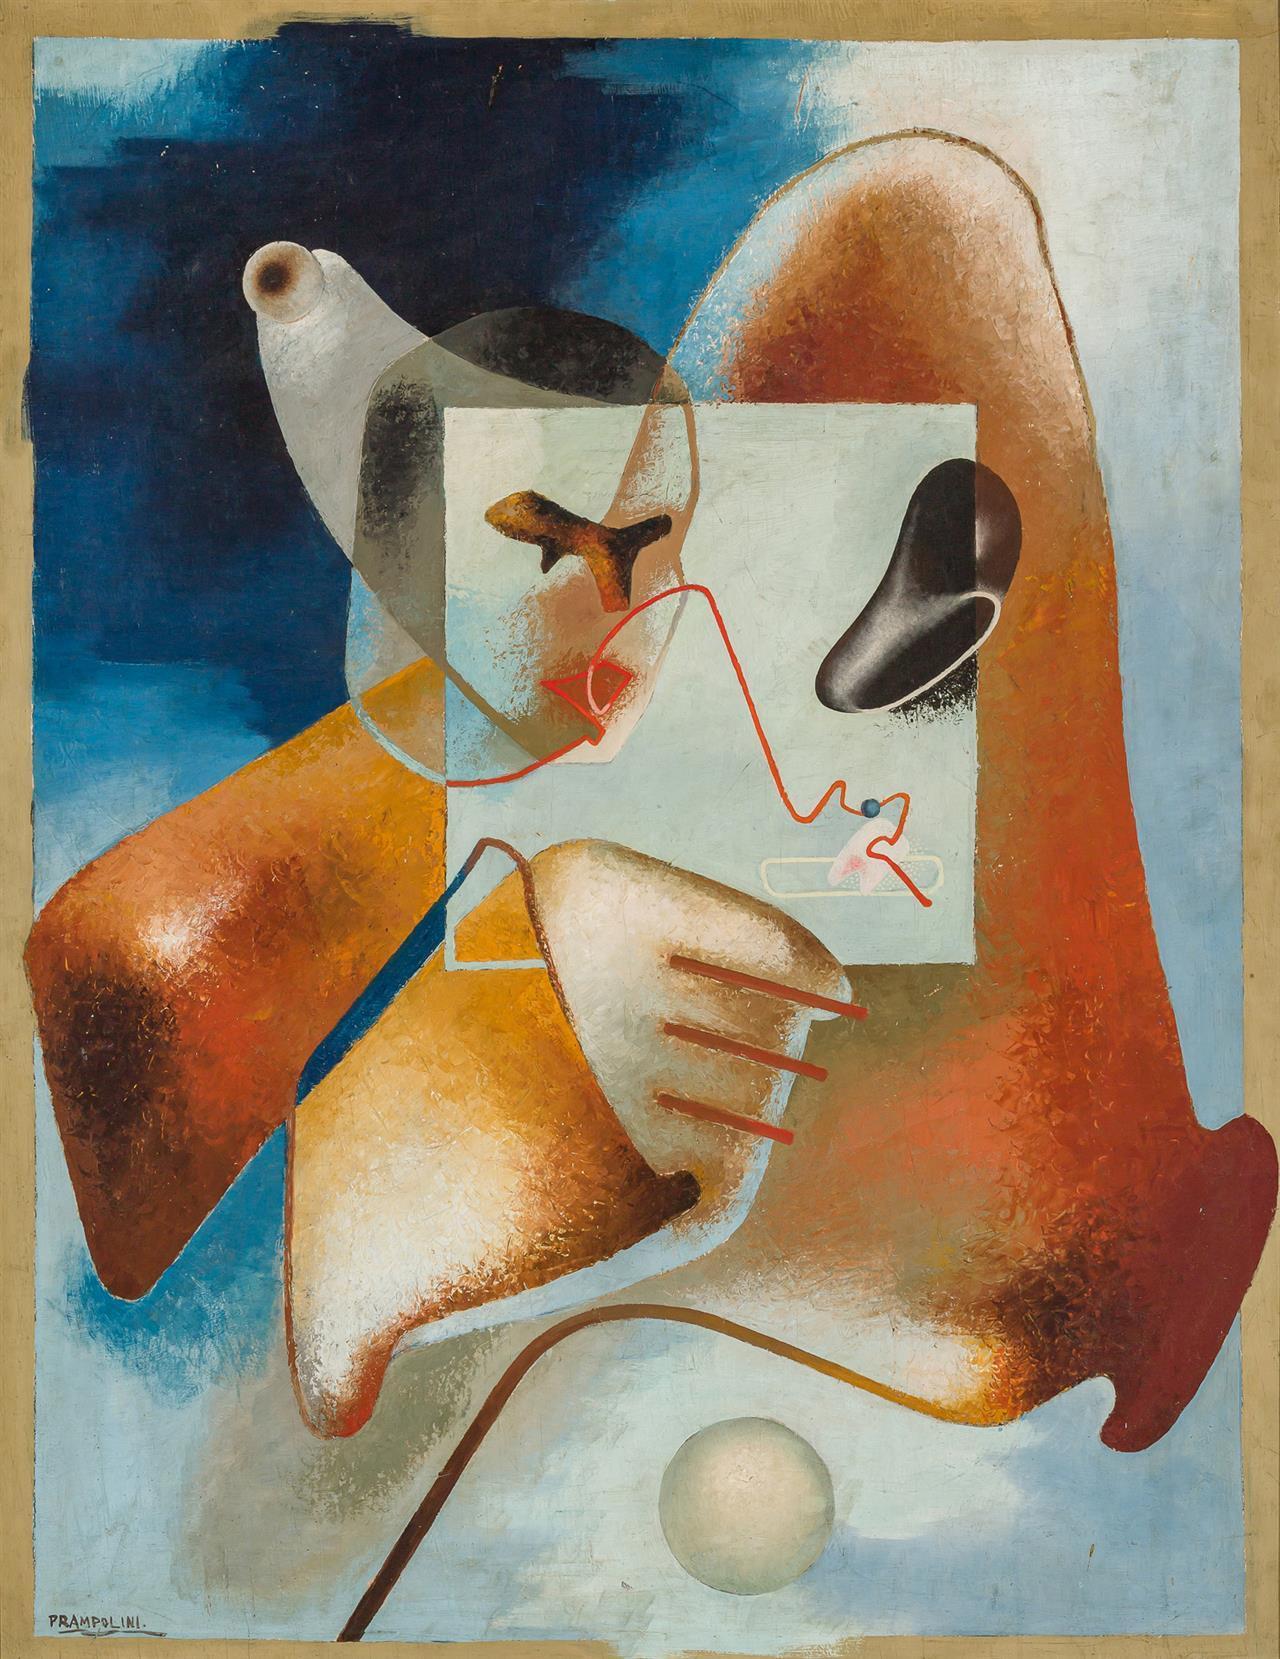 "ENRICO PRAMPOLINI, Italian (1894-1956), Surrealist Composition, oil on panel, signed ""Prampolini"" lower left, 45 3/4 x 35 inches"